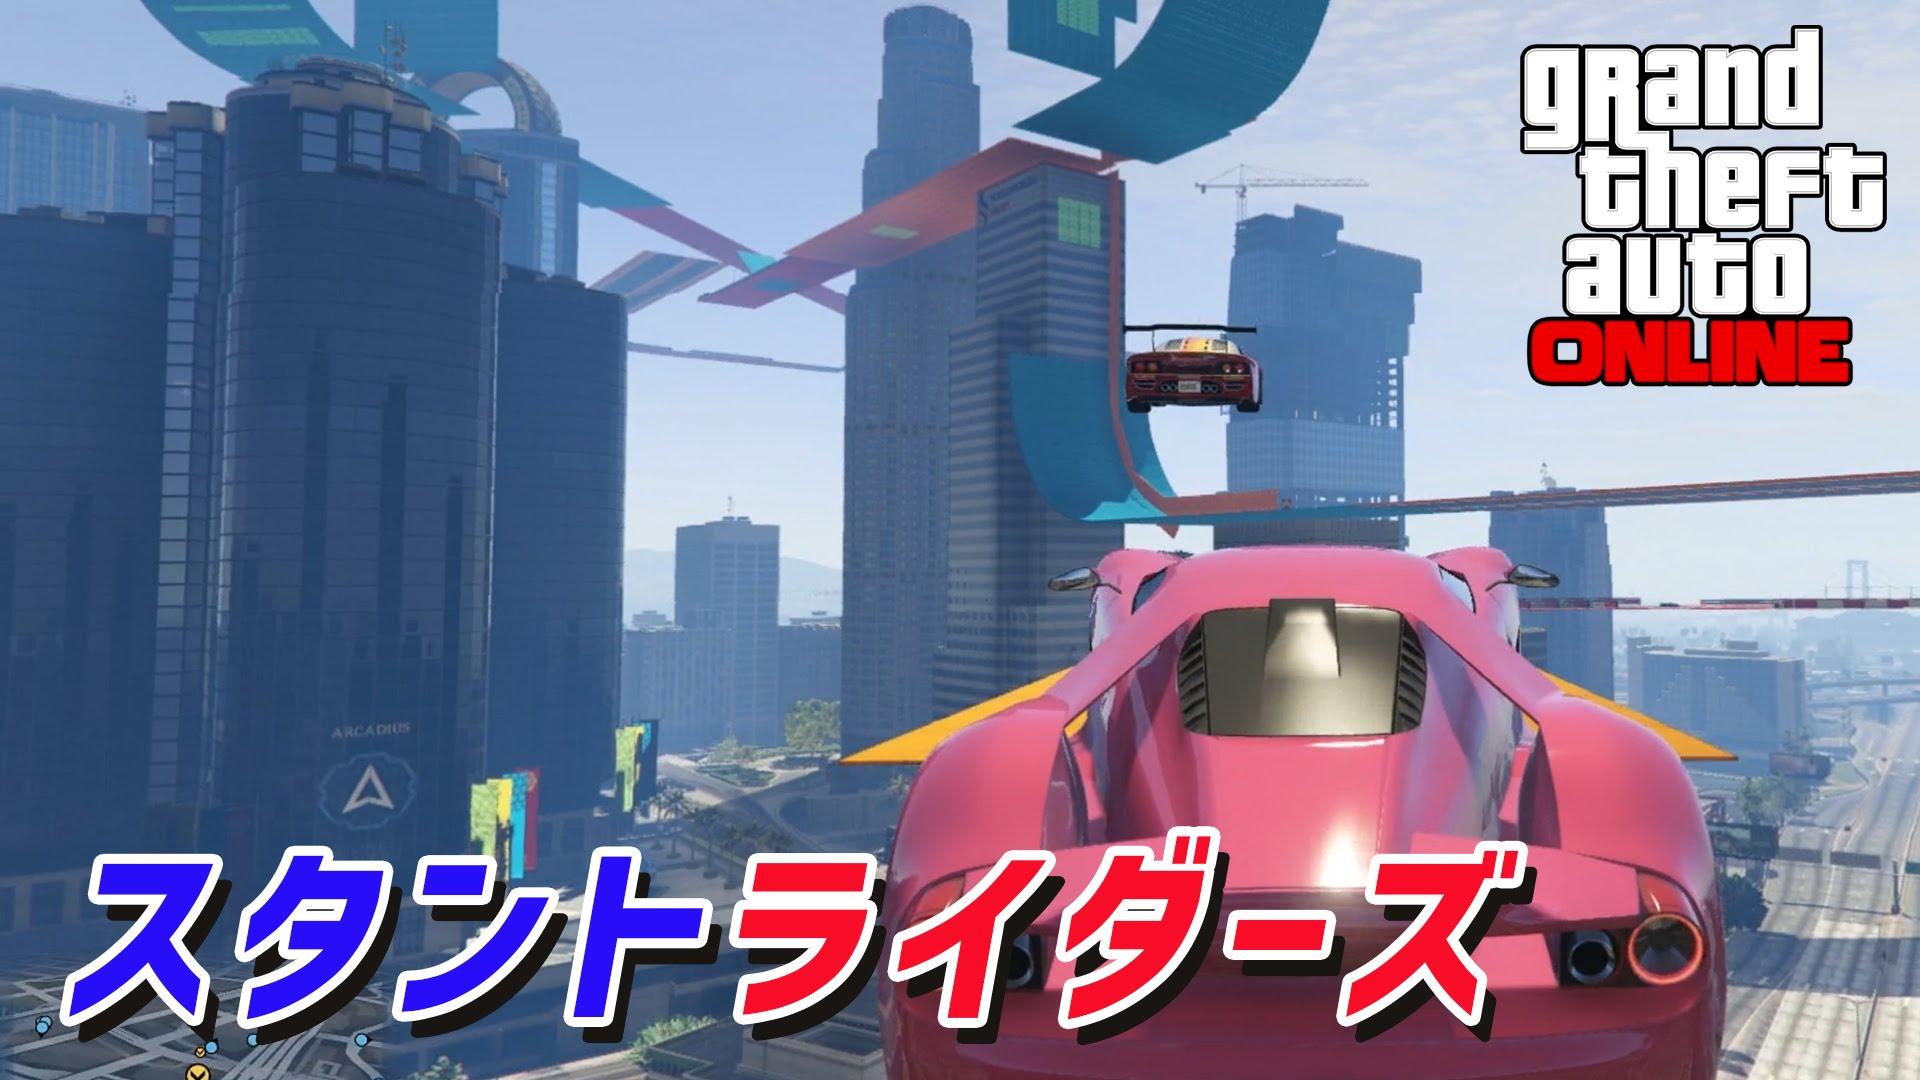 【PC版GTA Online】プレイ記録 【スタントライダーズアップデート】